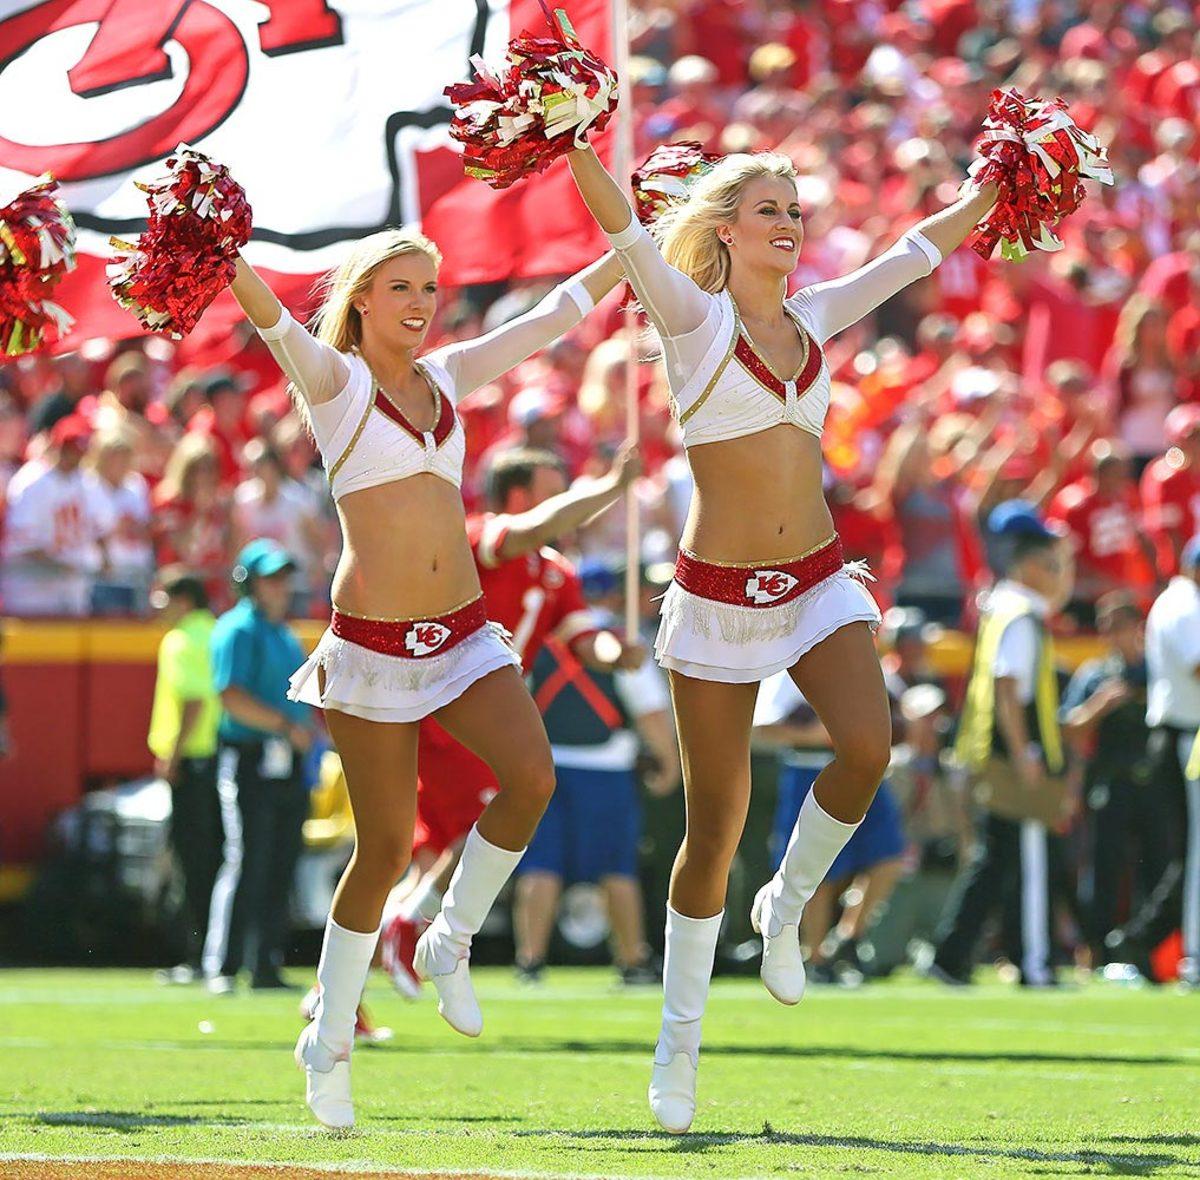 Kansas-City-Chiefs-cheerleaders-DGM160911619_Chargers_at_Chiefs.jpg